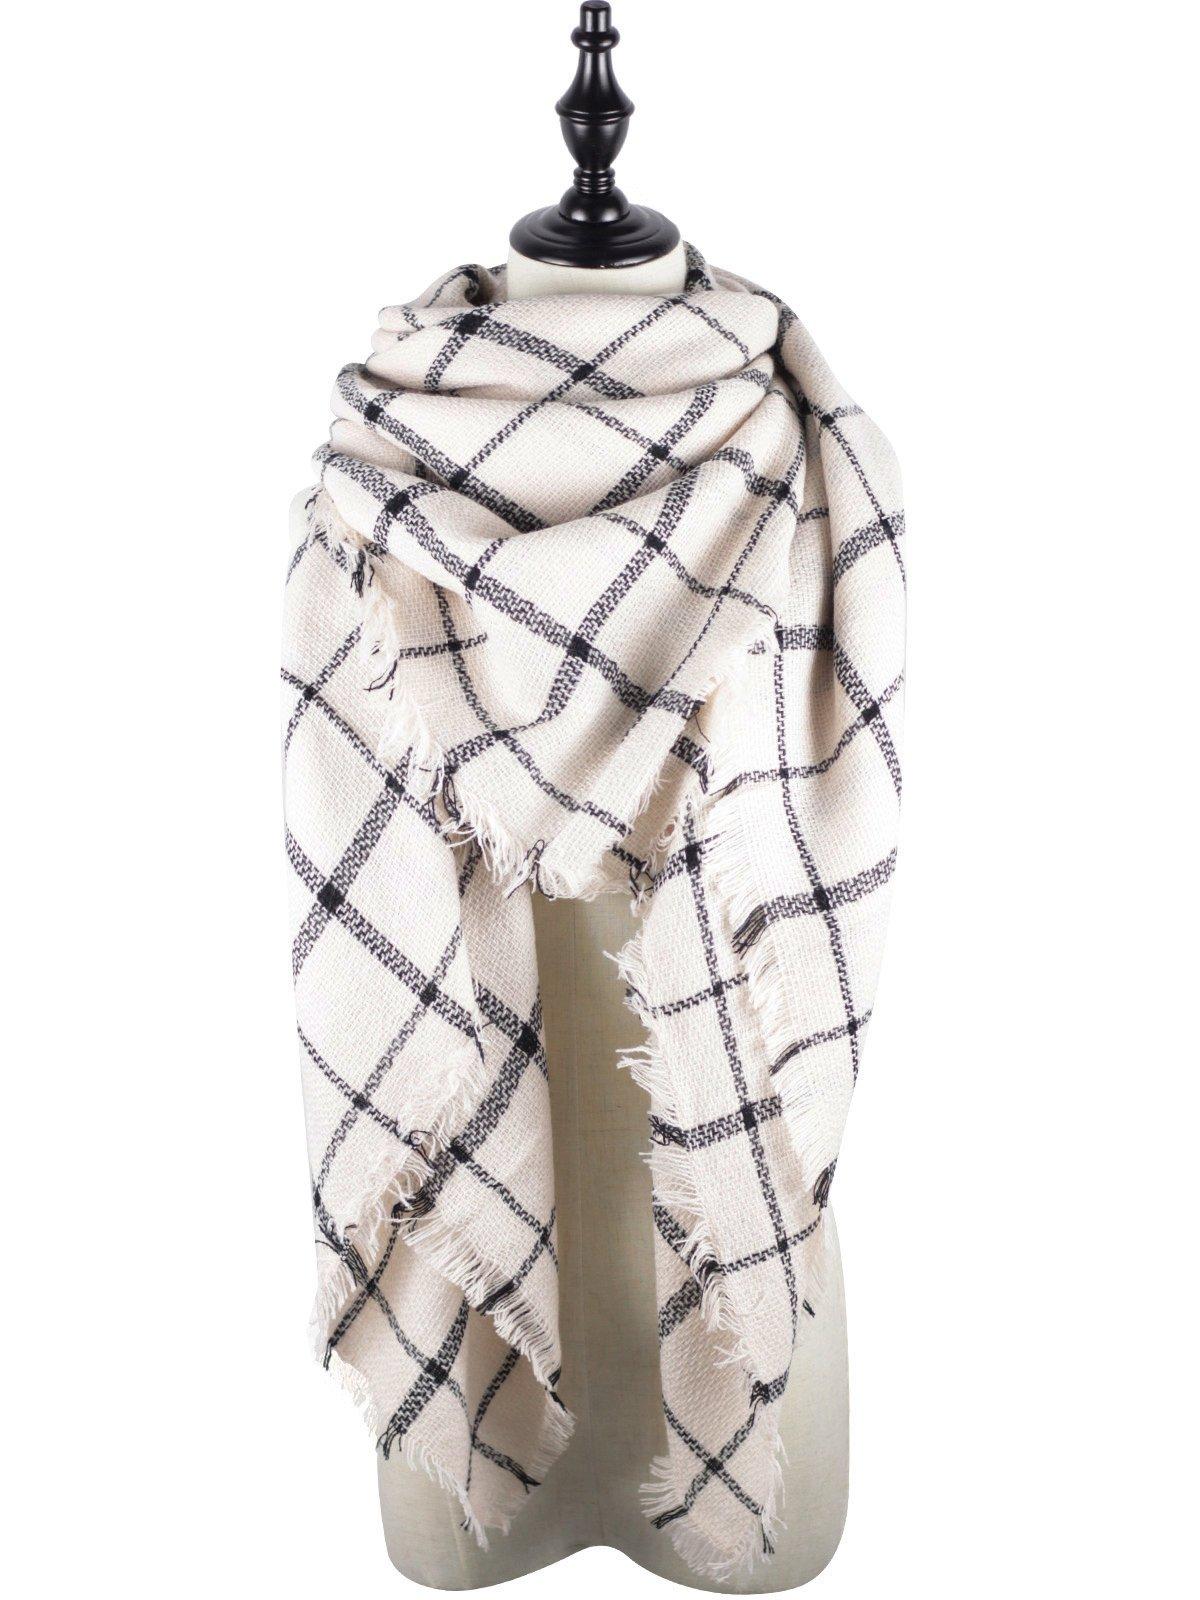 Zando Stylish Fall Winter Scarf Large Thick Wrap Cotton Oversized Scarf Women Tartan Plaid Blanket Scarf Cape Scarfs for Women A Beige Black Stripe Scarf